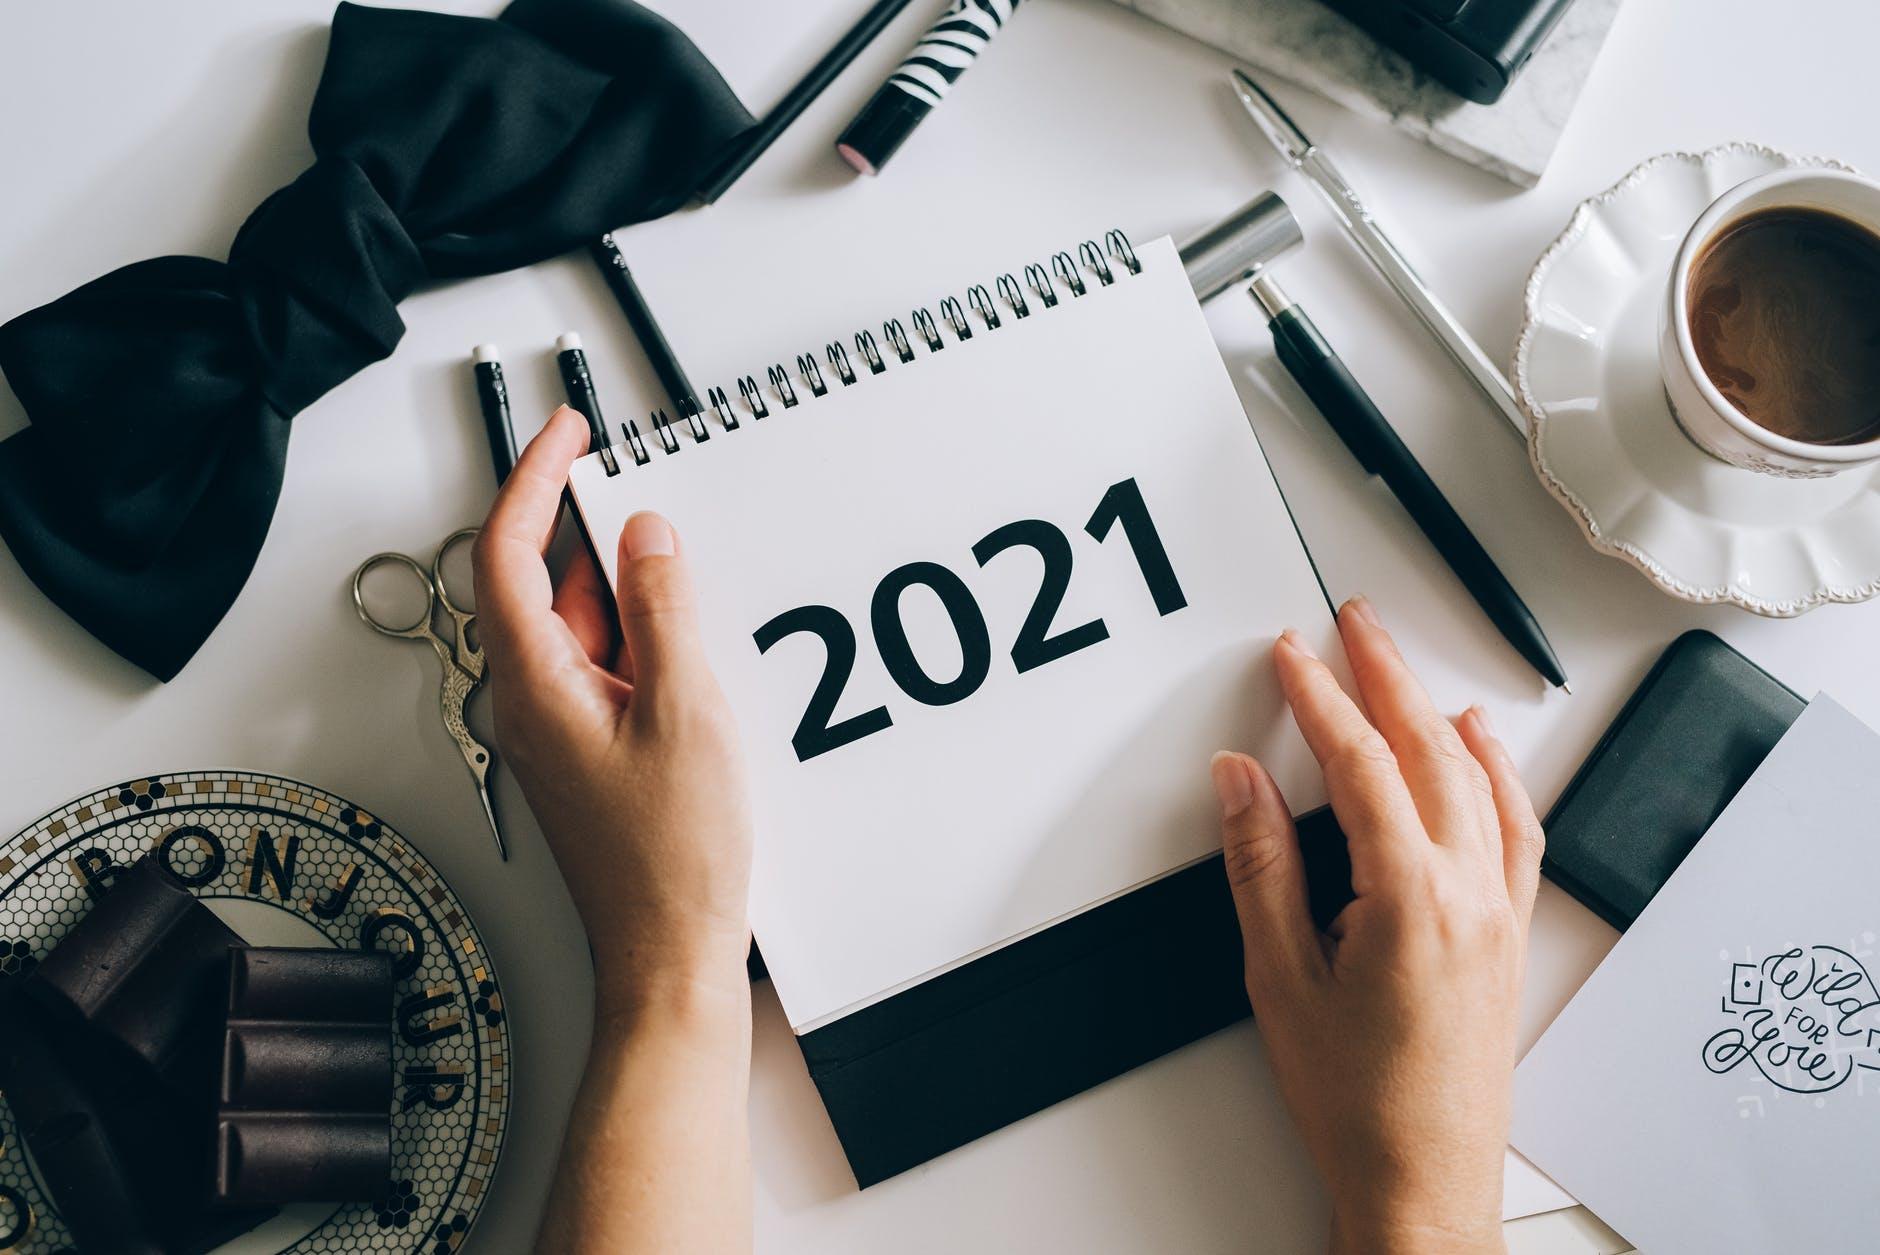 2021 Workplace Predictions from Dan Schawbel